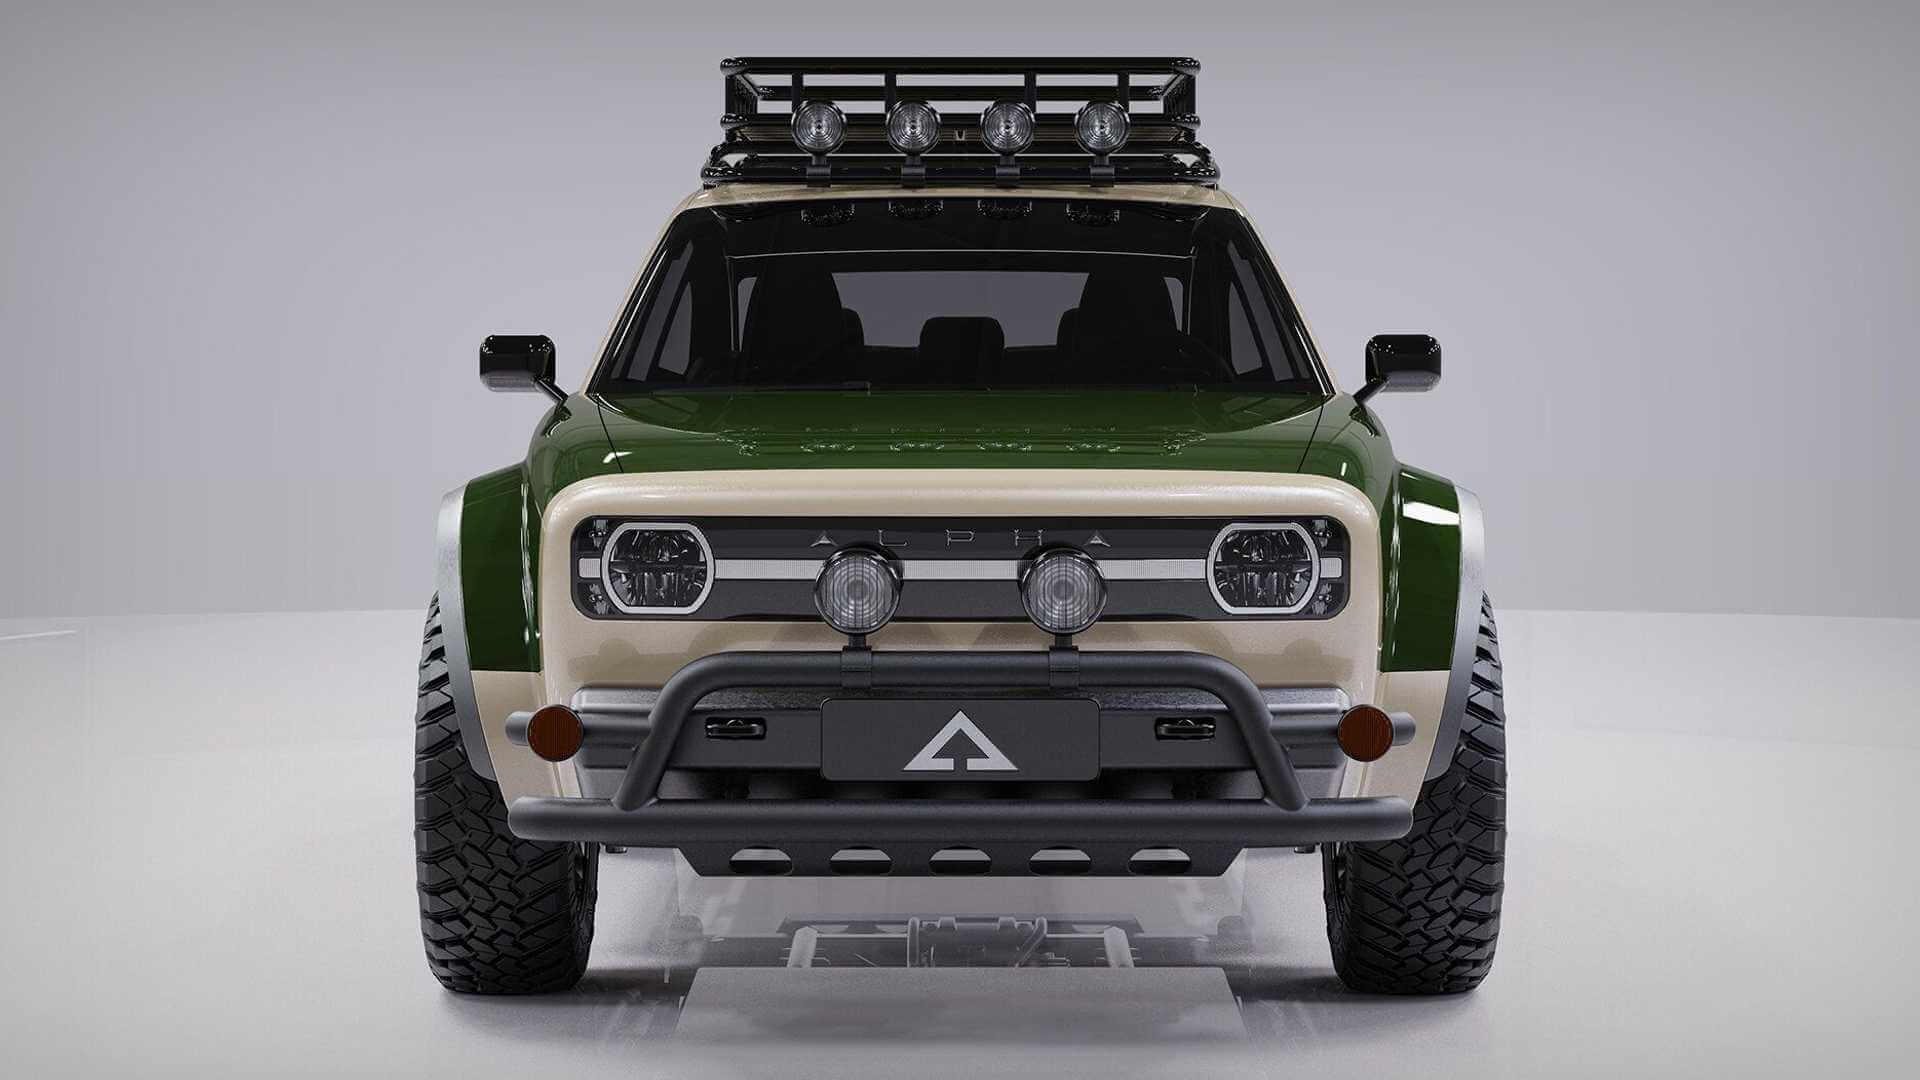 Alpha Motor презентовала электрическую новинку JAX CUV